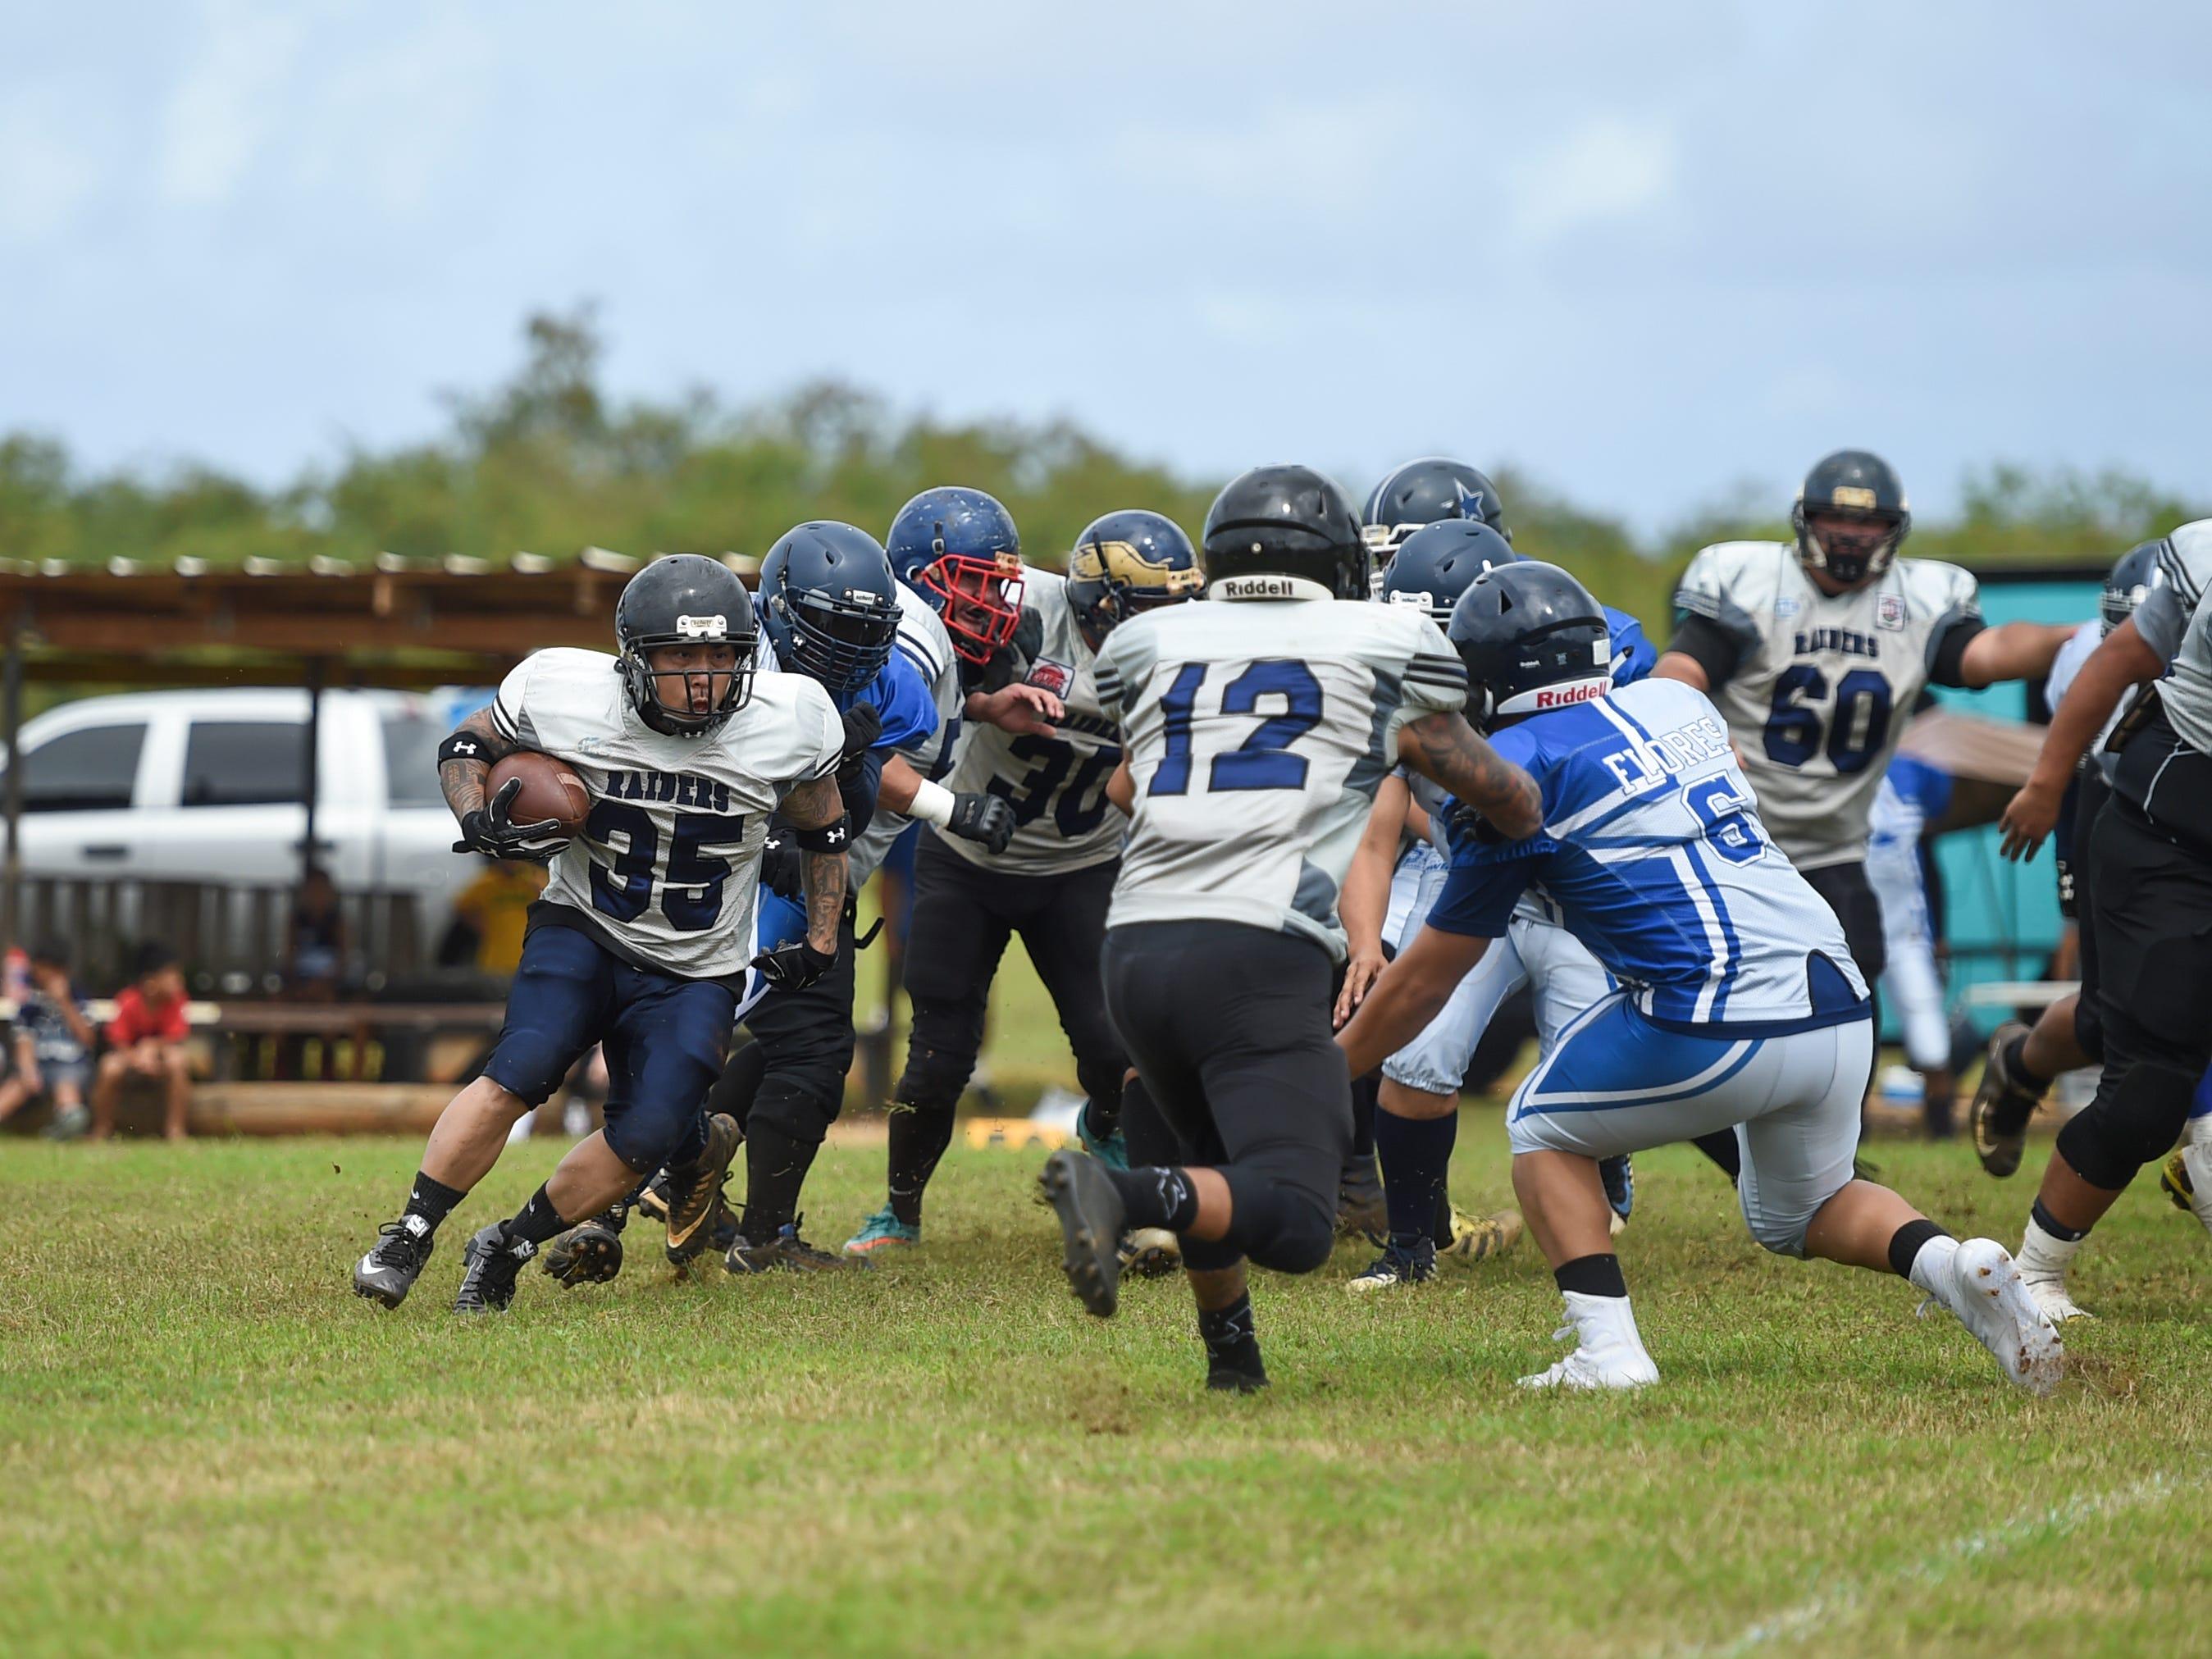 The Guam Raiders' Dave Delgado (35) rushes against the Southern Cowboys during their Budweiser Guahan Varsity Football League game at Eagles Field in Mangilao, Feb. 2, 2019.